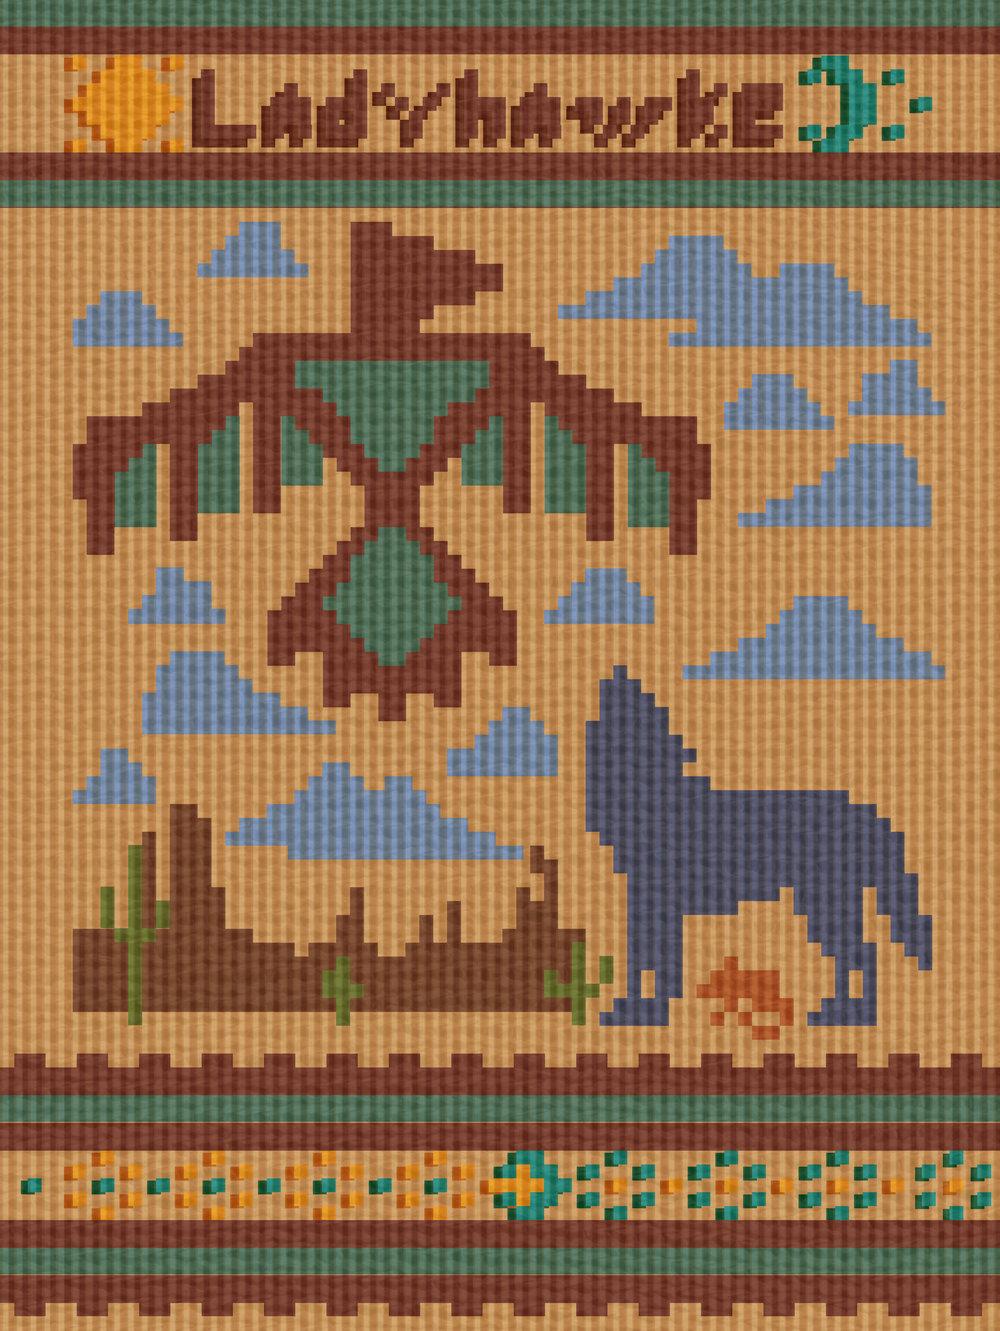 Ladyhawke-Tapestry.jpg